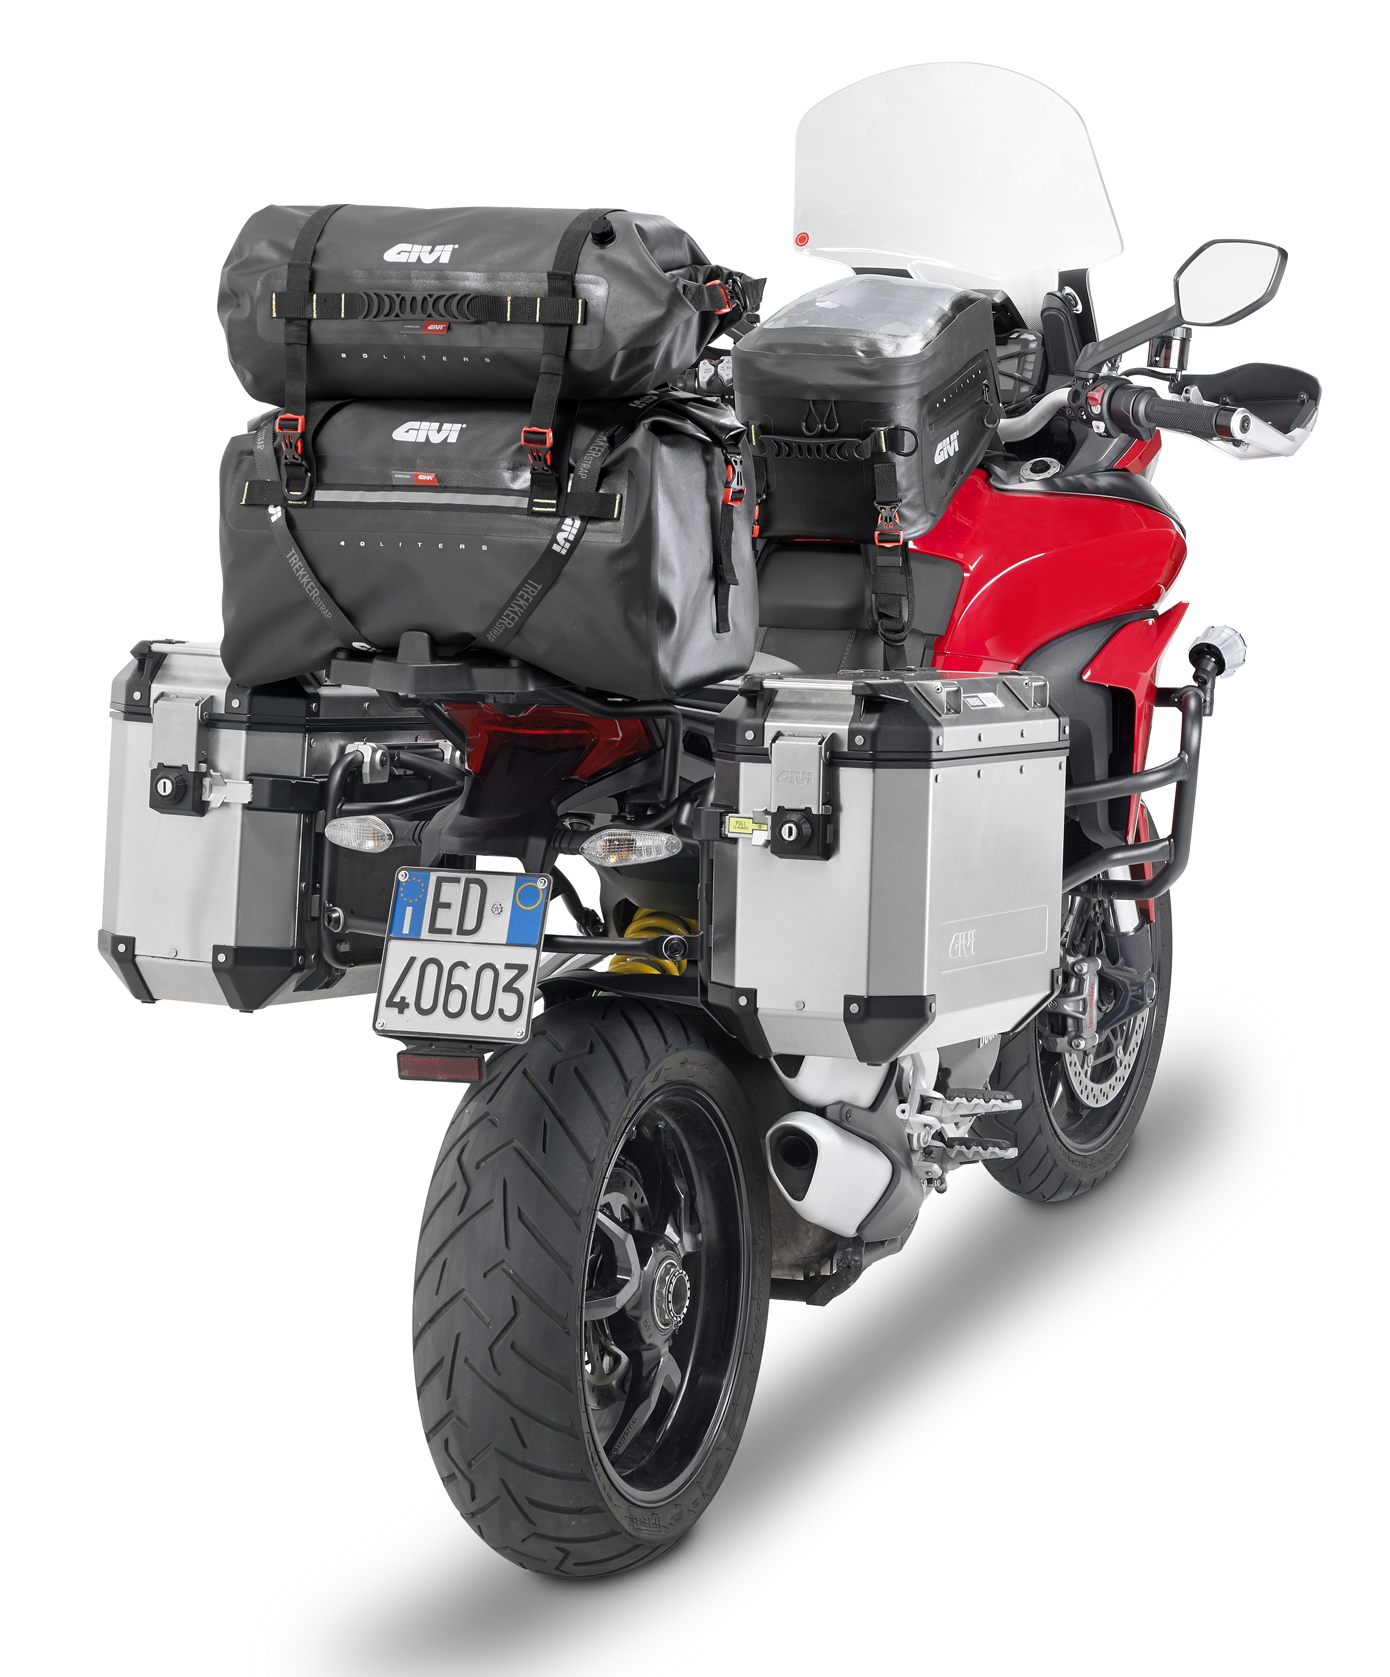 Tankrucksack Ducati Hypermotard 821 Givi GRT705 20 Liter